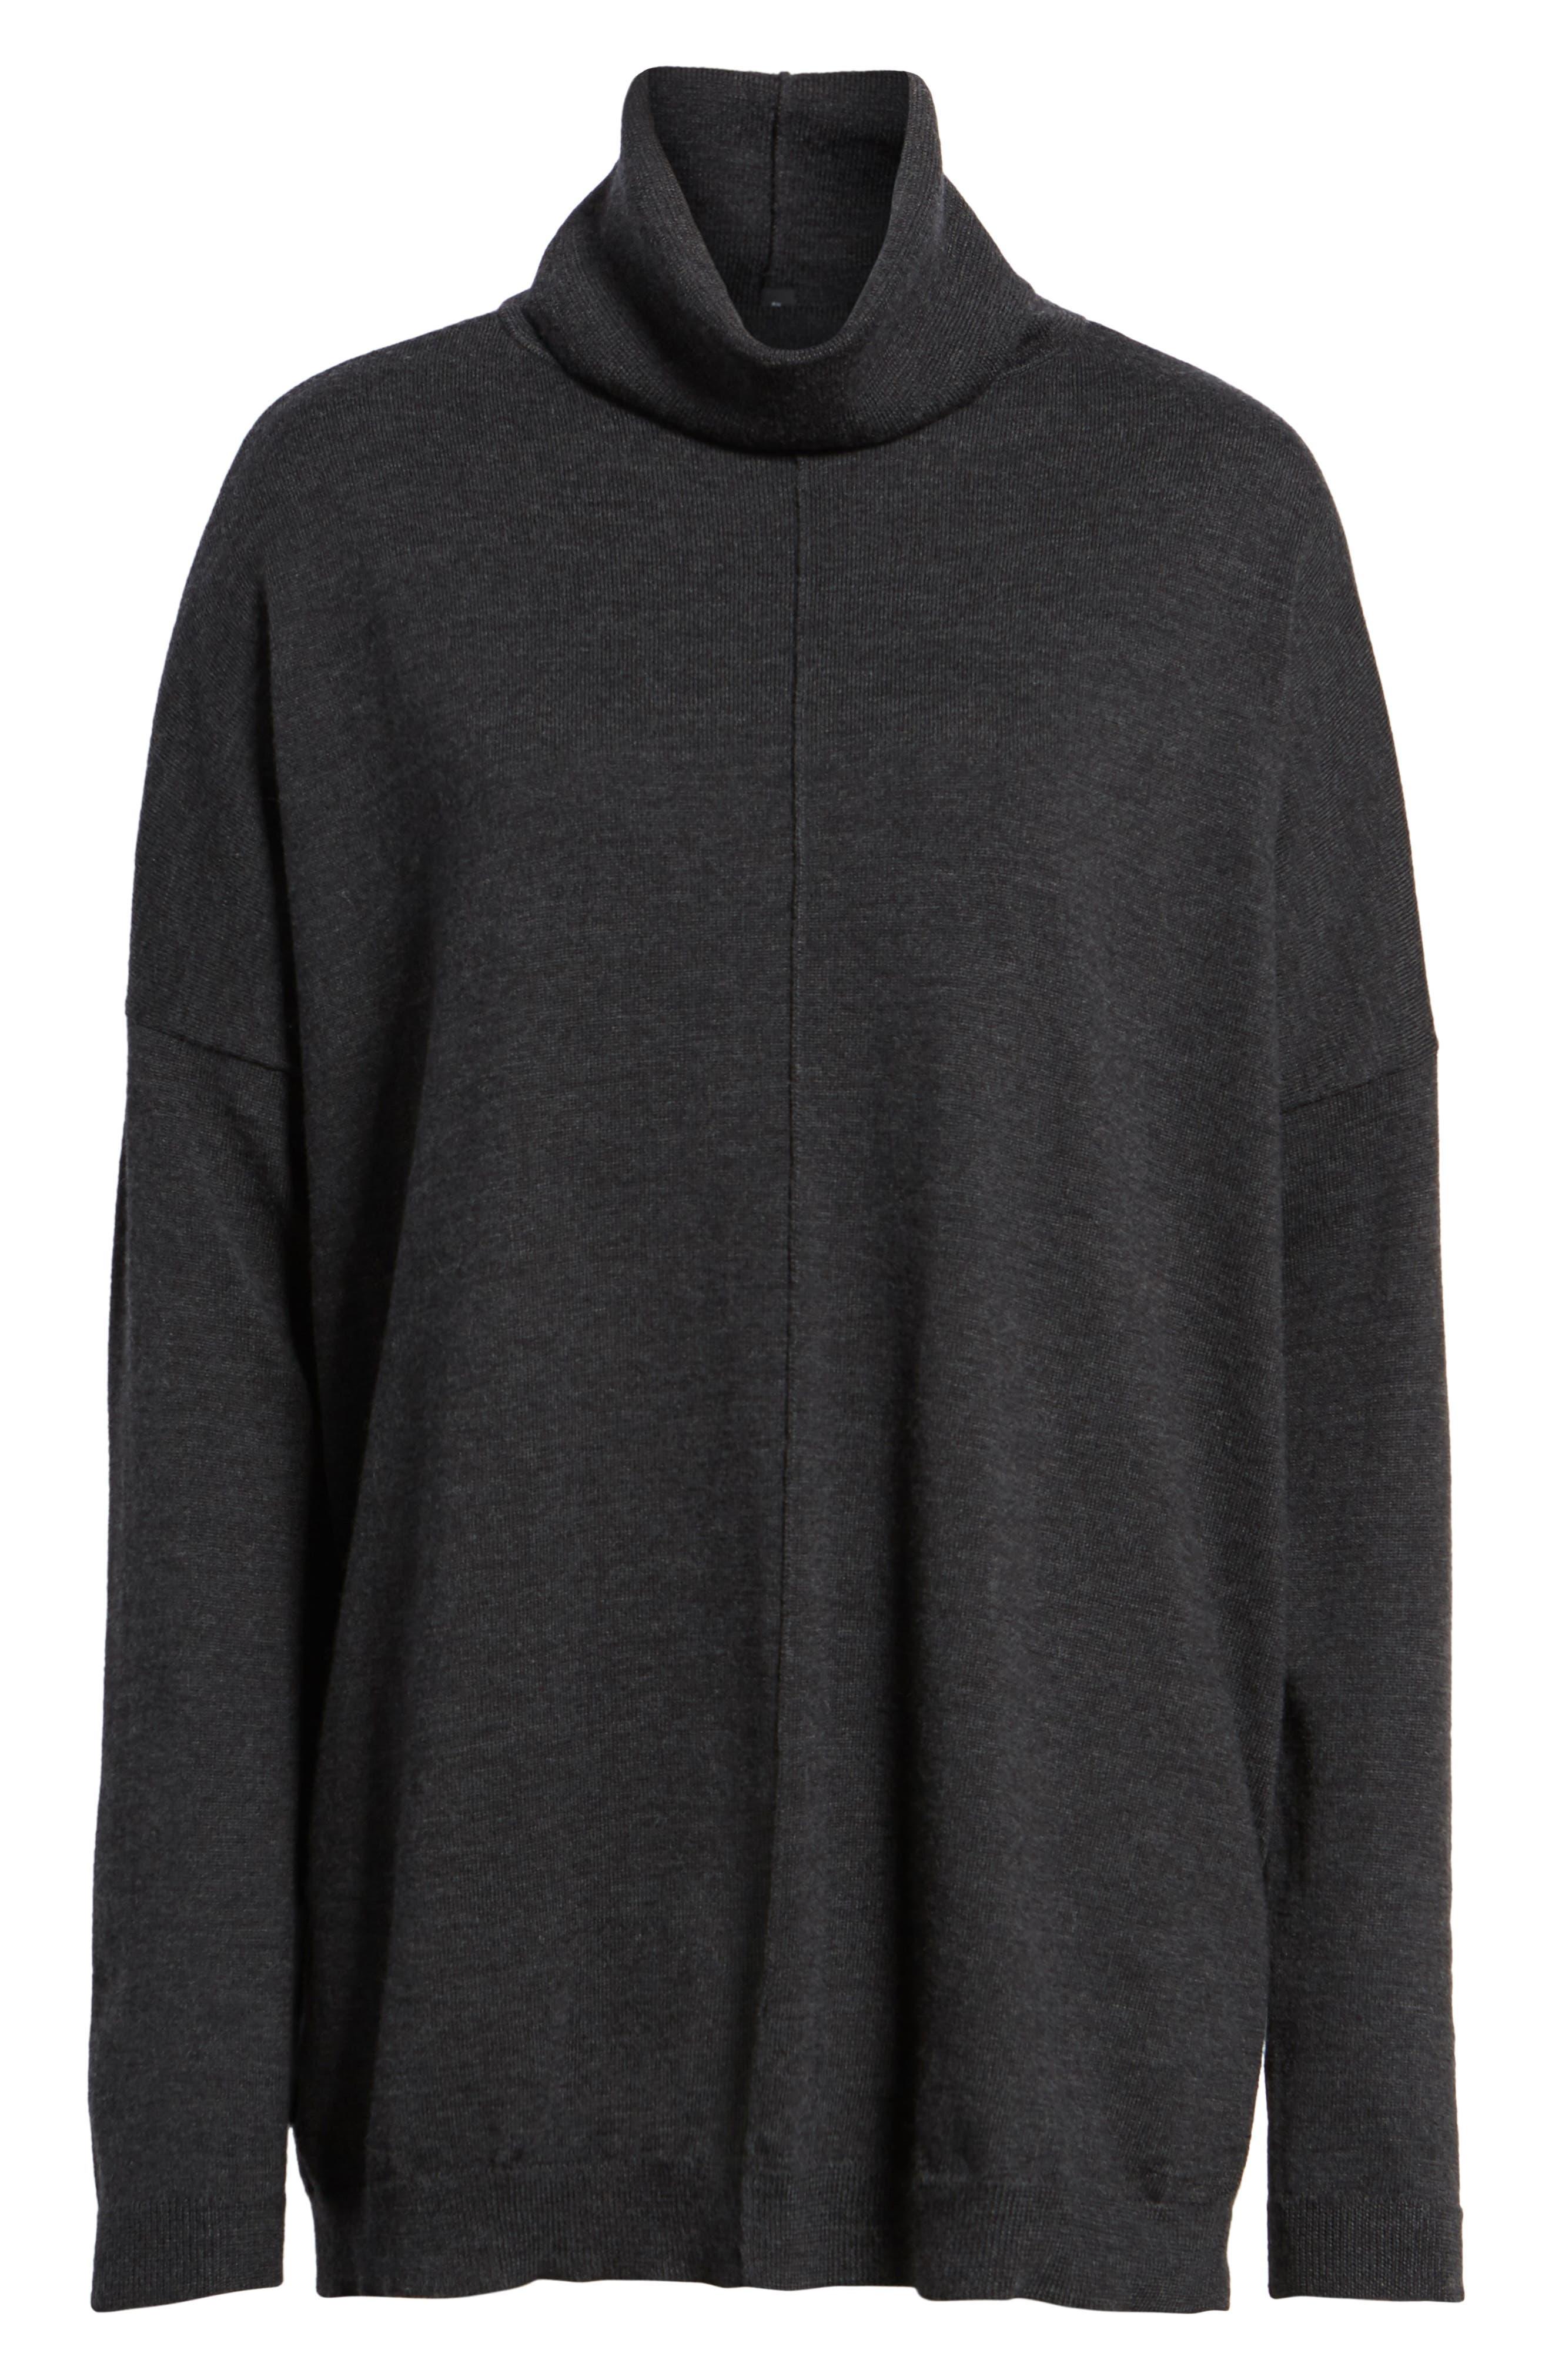 Merino Wool Boxy Turtleneck Sweater,                         Main,                         color, Charcoal